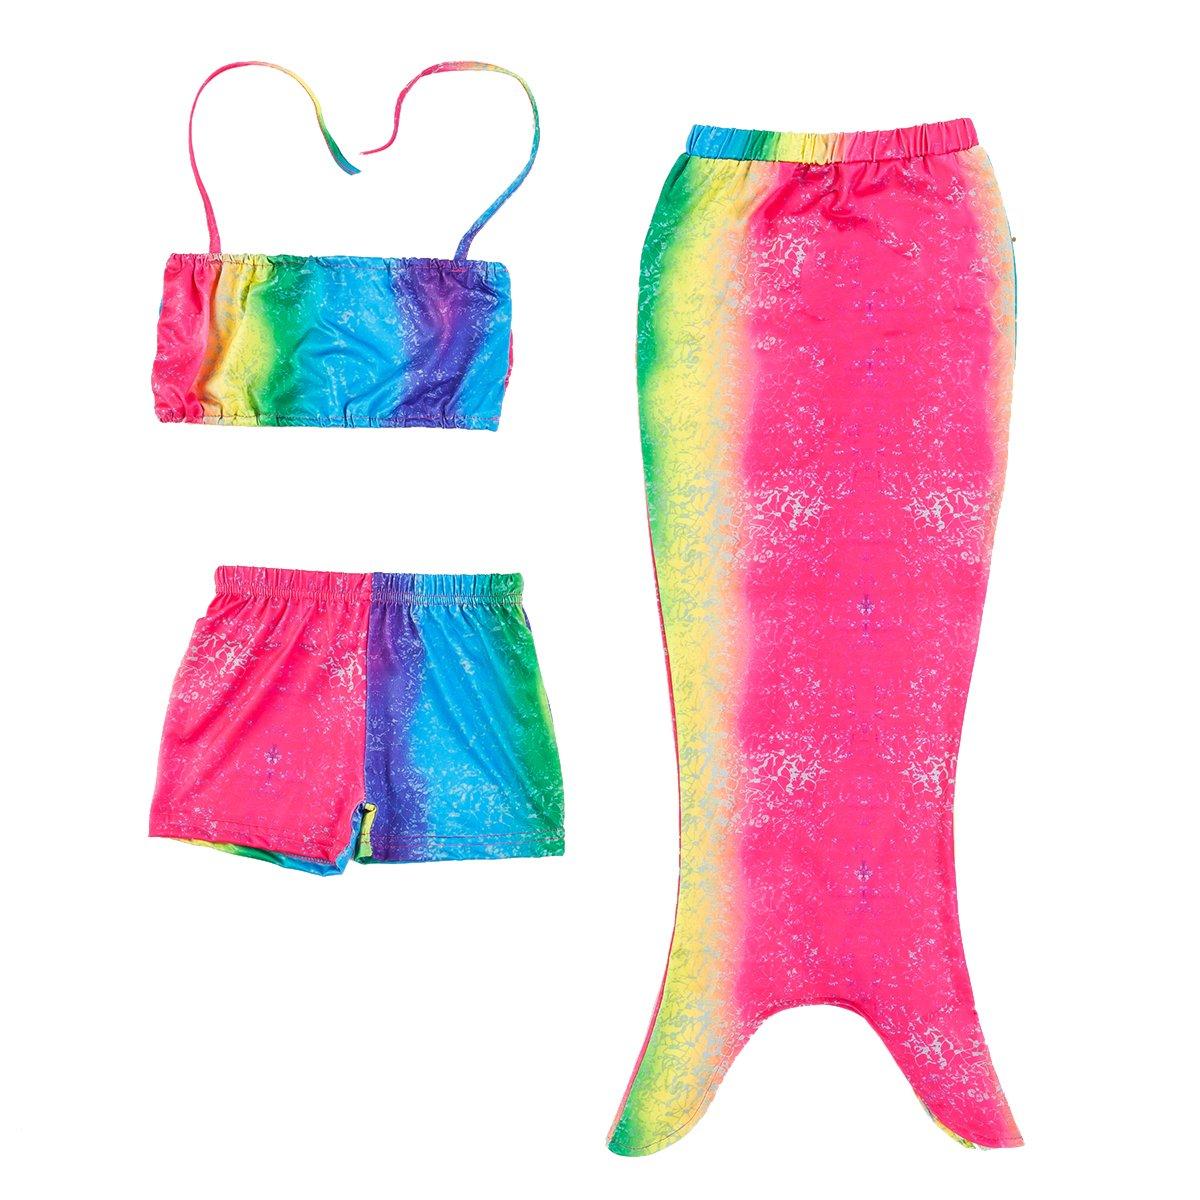 PGXT Girls 3 Pcs Mermaid Tail Rainbow Fish scale Bathing Suit Swimwear Summerswim001-Rainbow-M